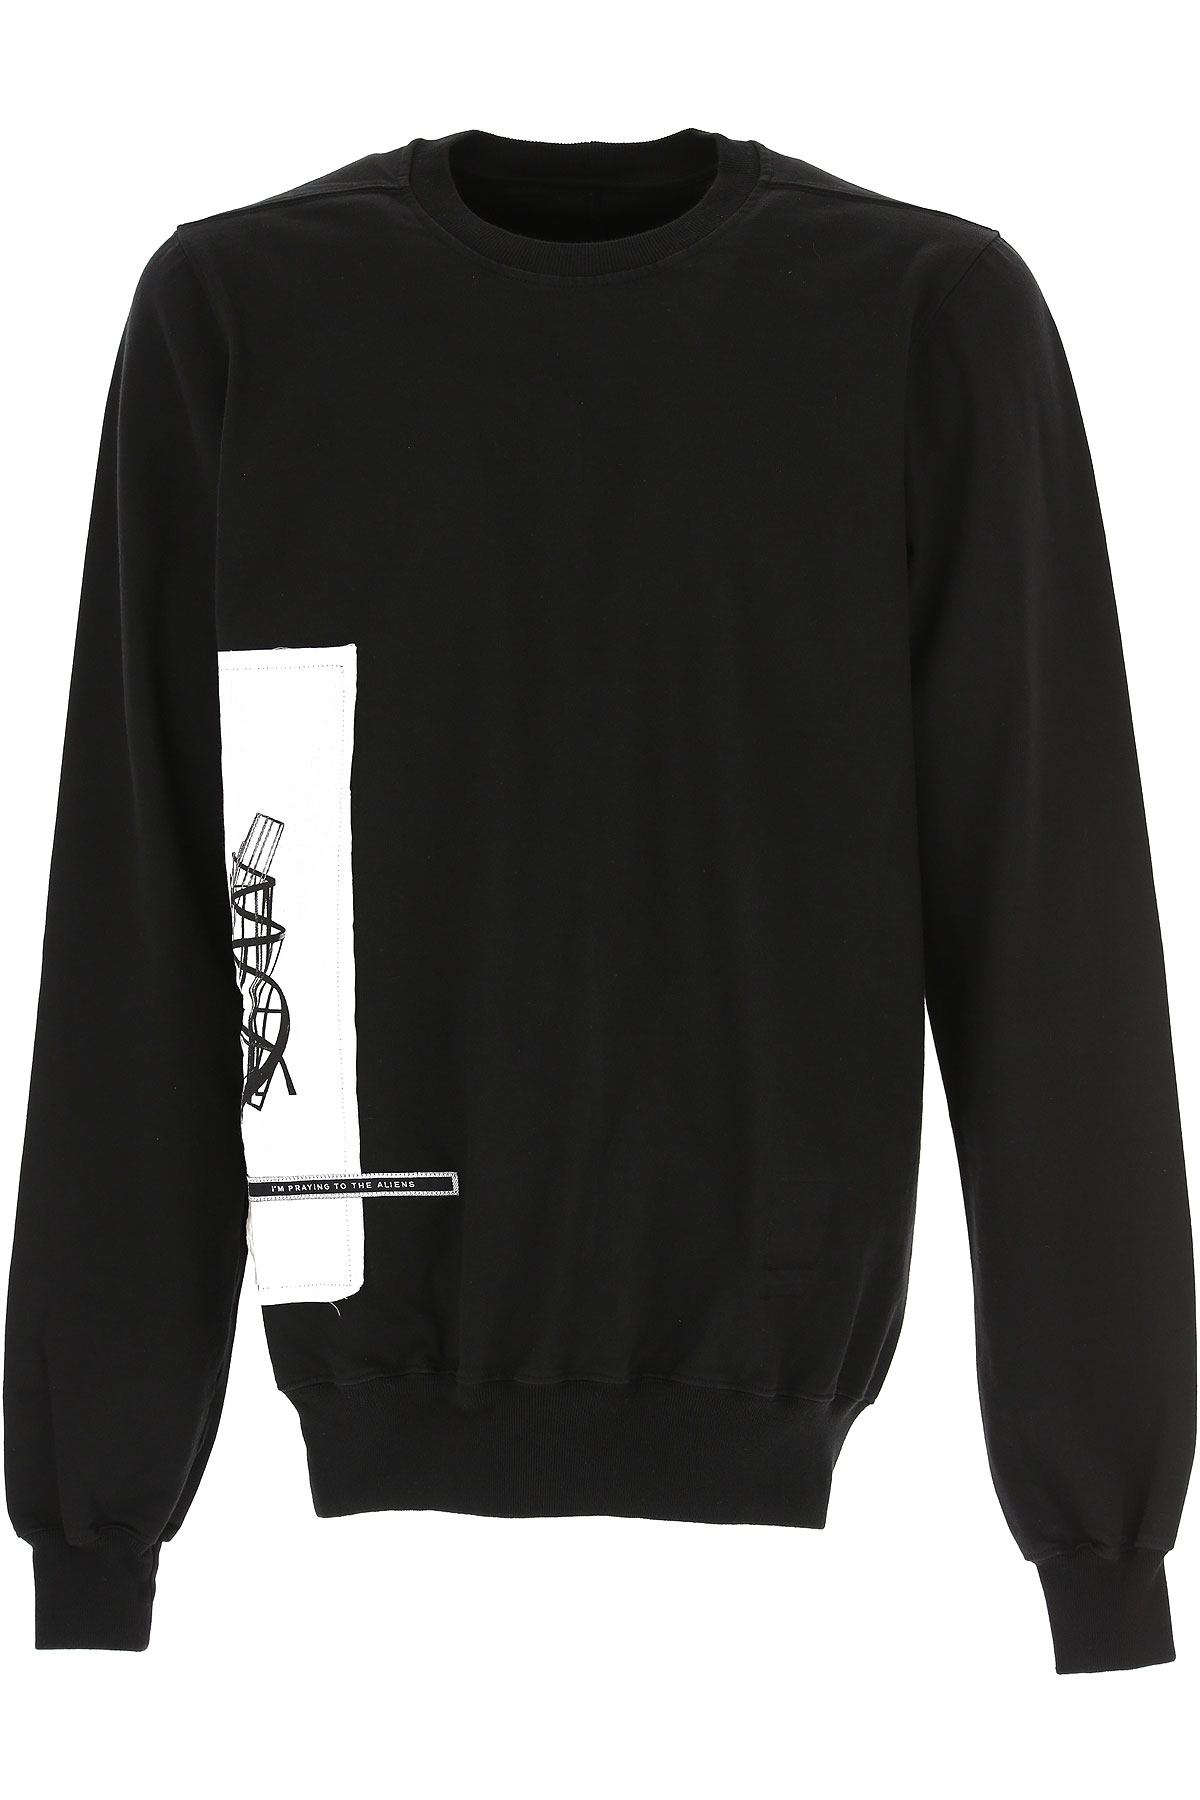 Rick Owens DRKSHDW T-Shirt for Men On Sale in Outlet, Black, Cotton, 2019, L M S XL